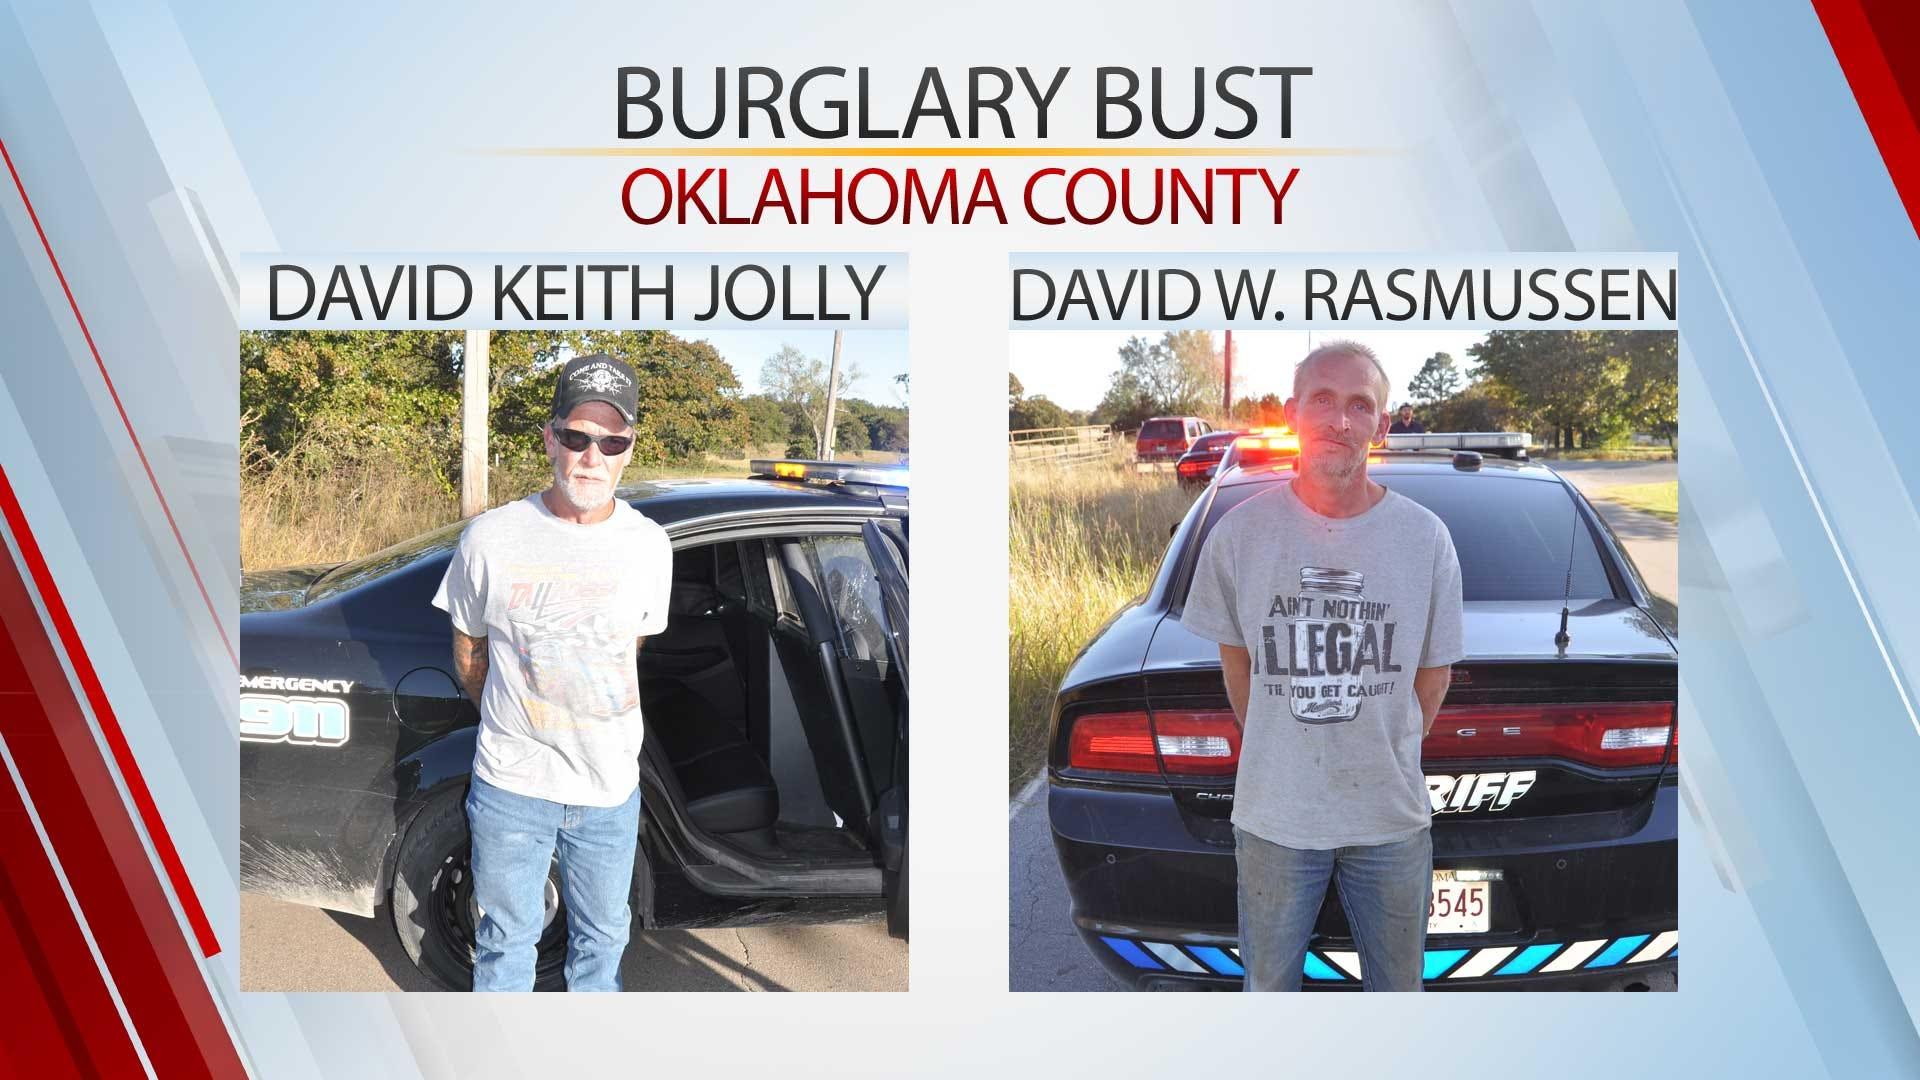 2 Arrested In Oklahoma County Burglary Bust